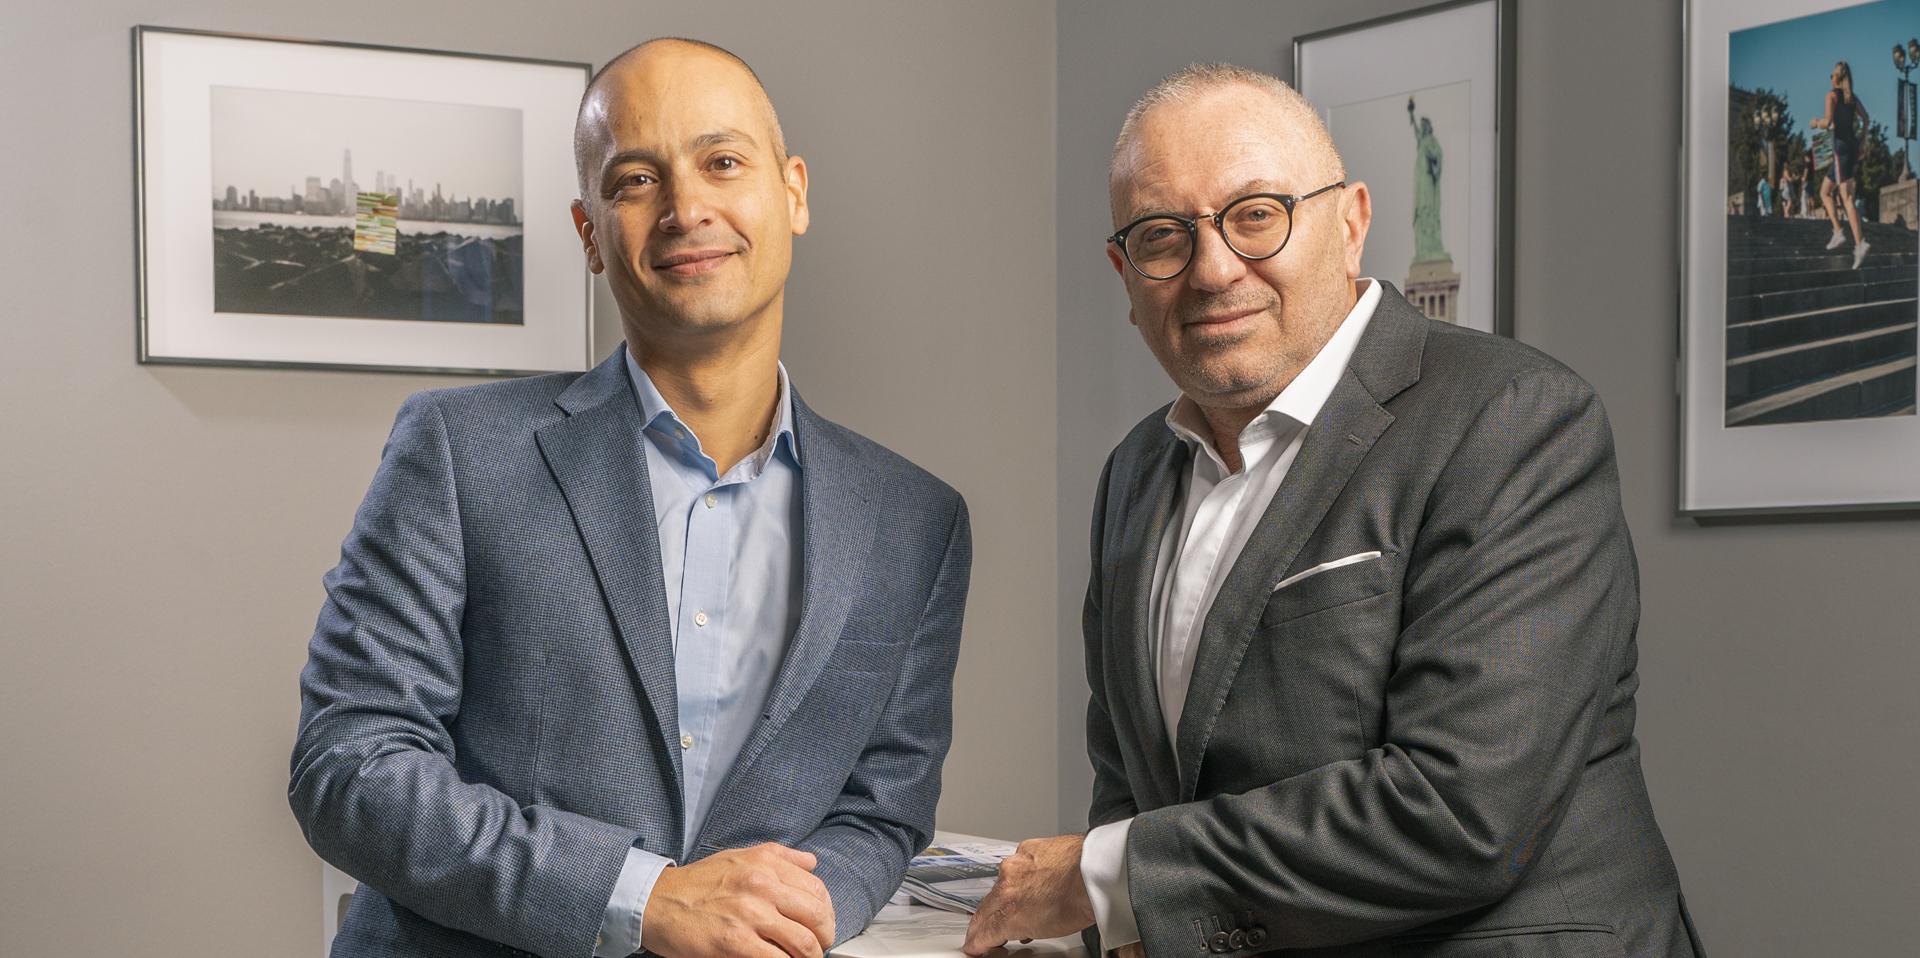 Trendcity John Amram und Ilja Gop